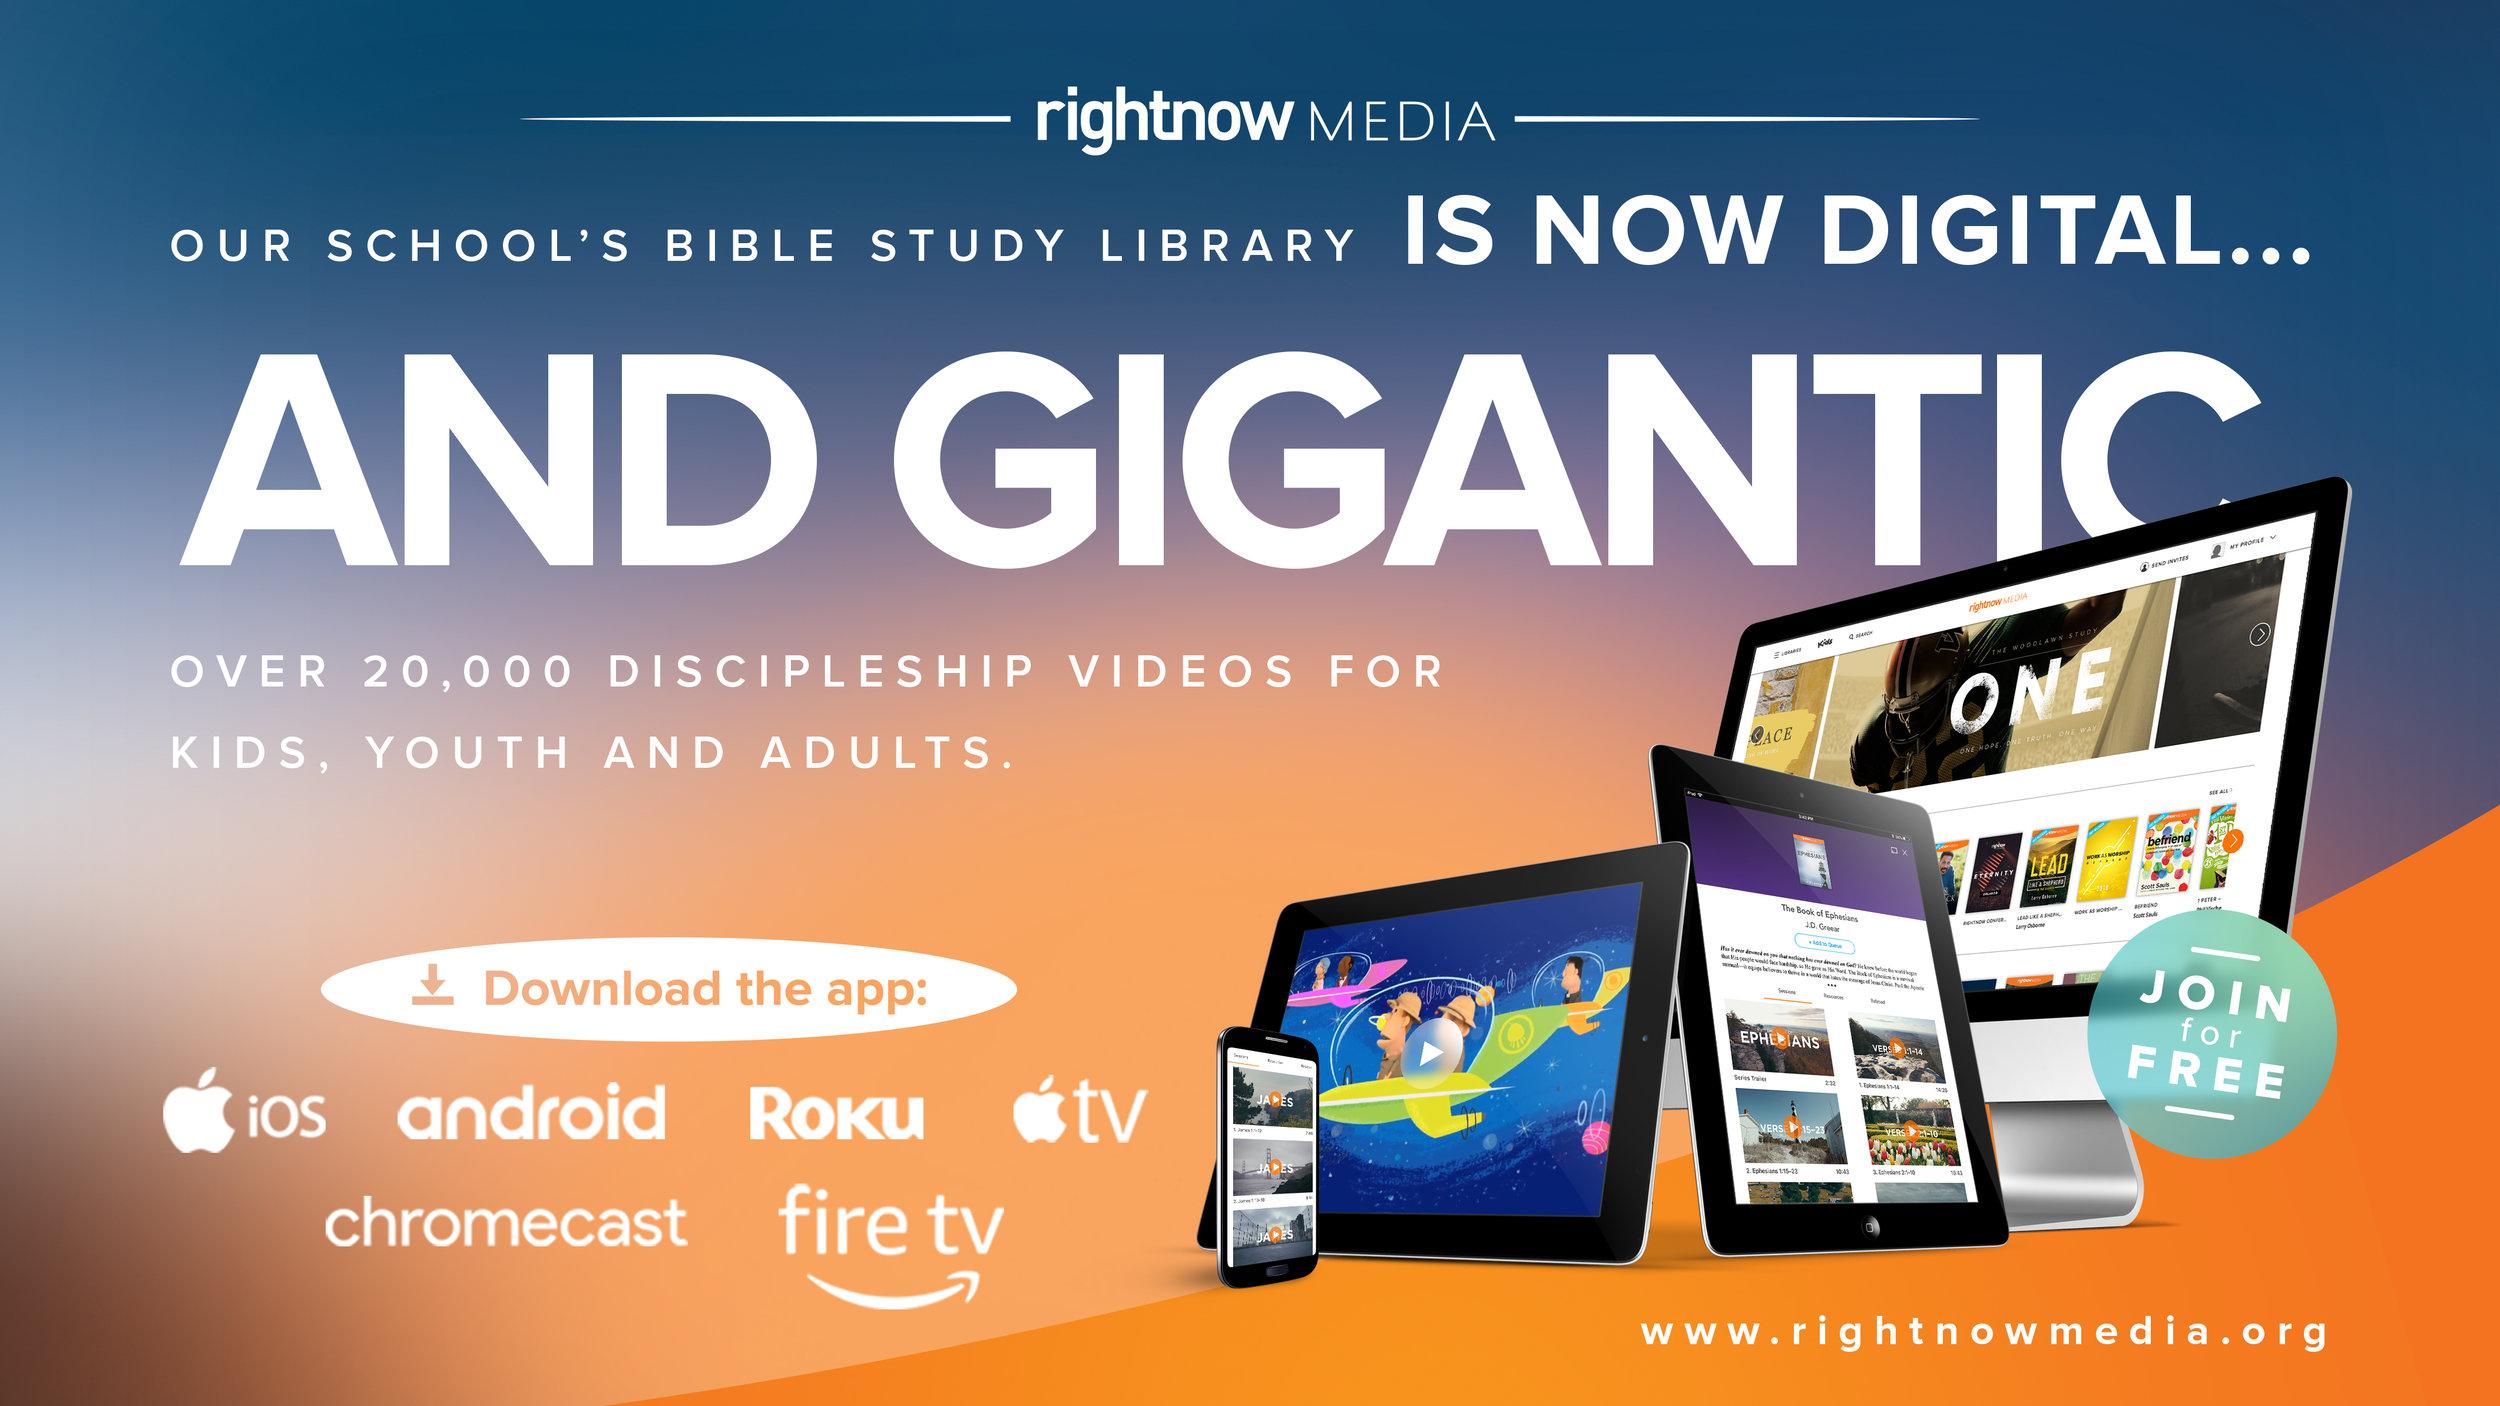 RightNow Media Gigantic Video Library.jpg